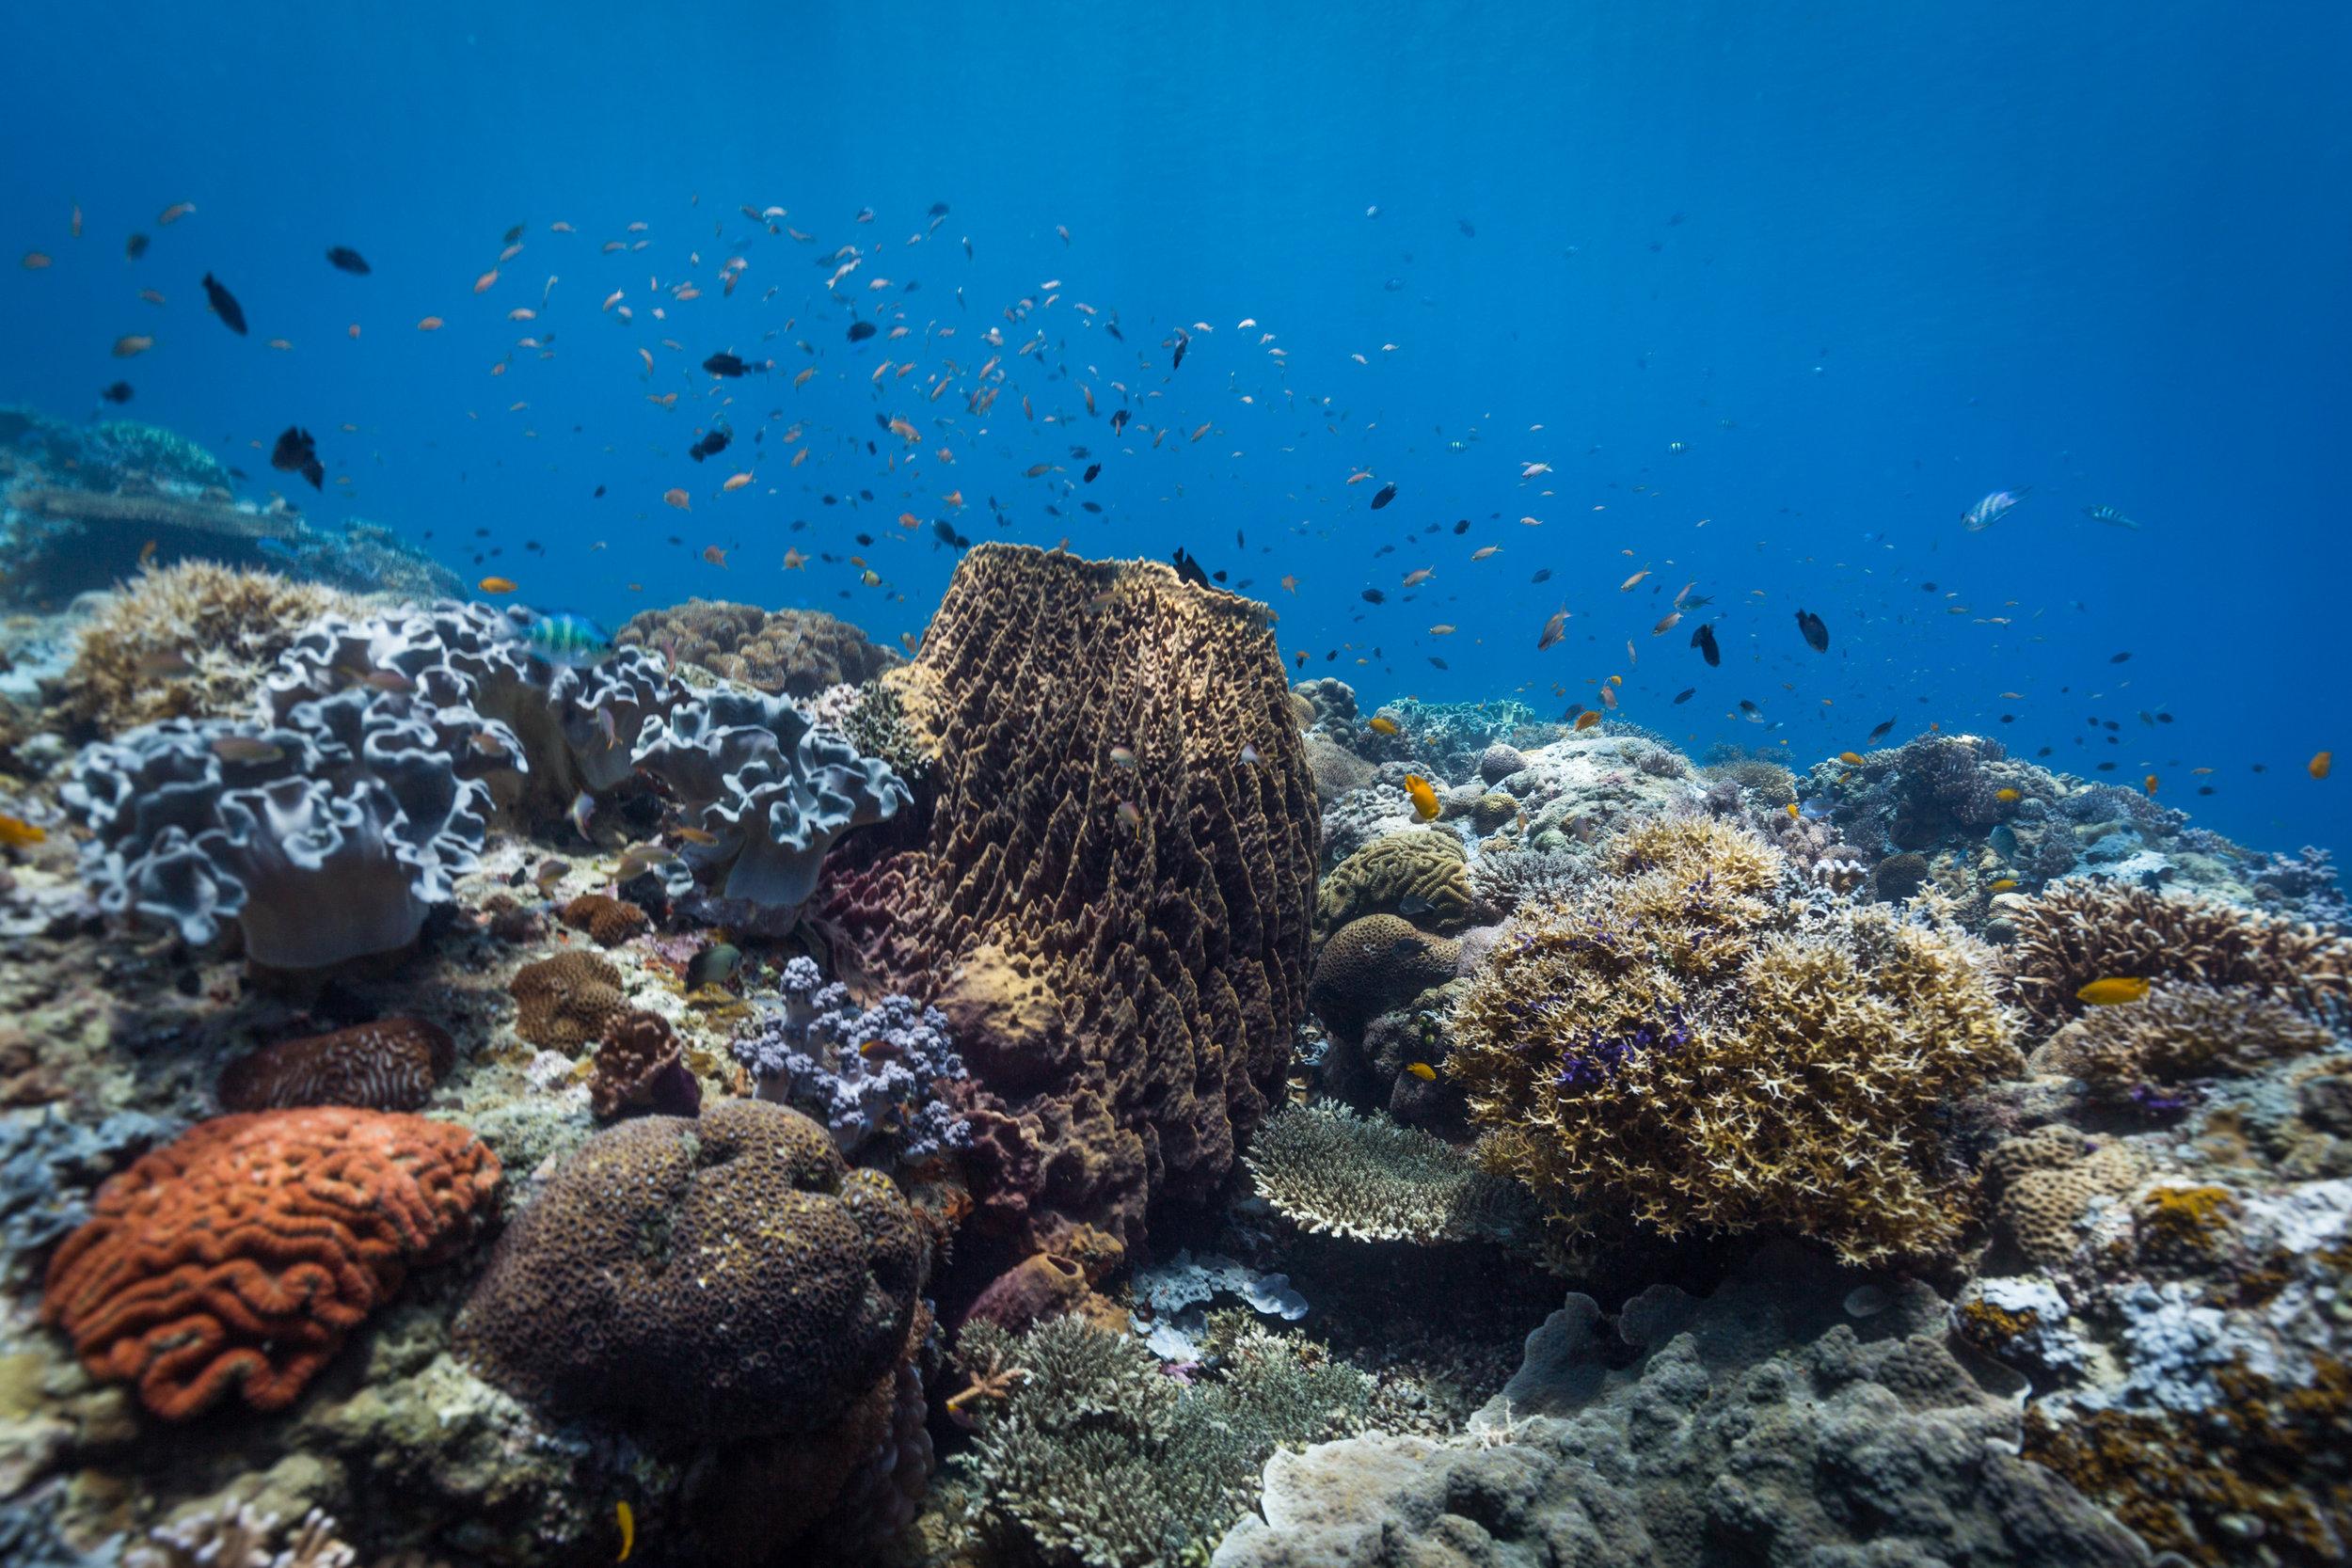 A coral garden from Danjugan Island, Philippines.